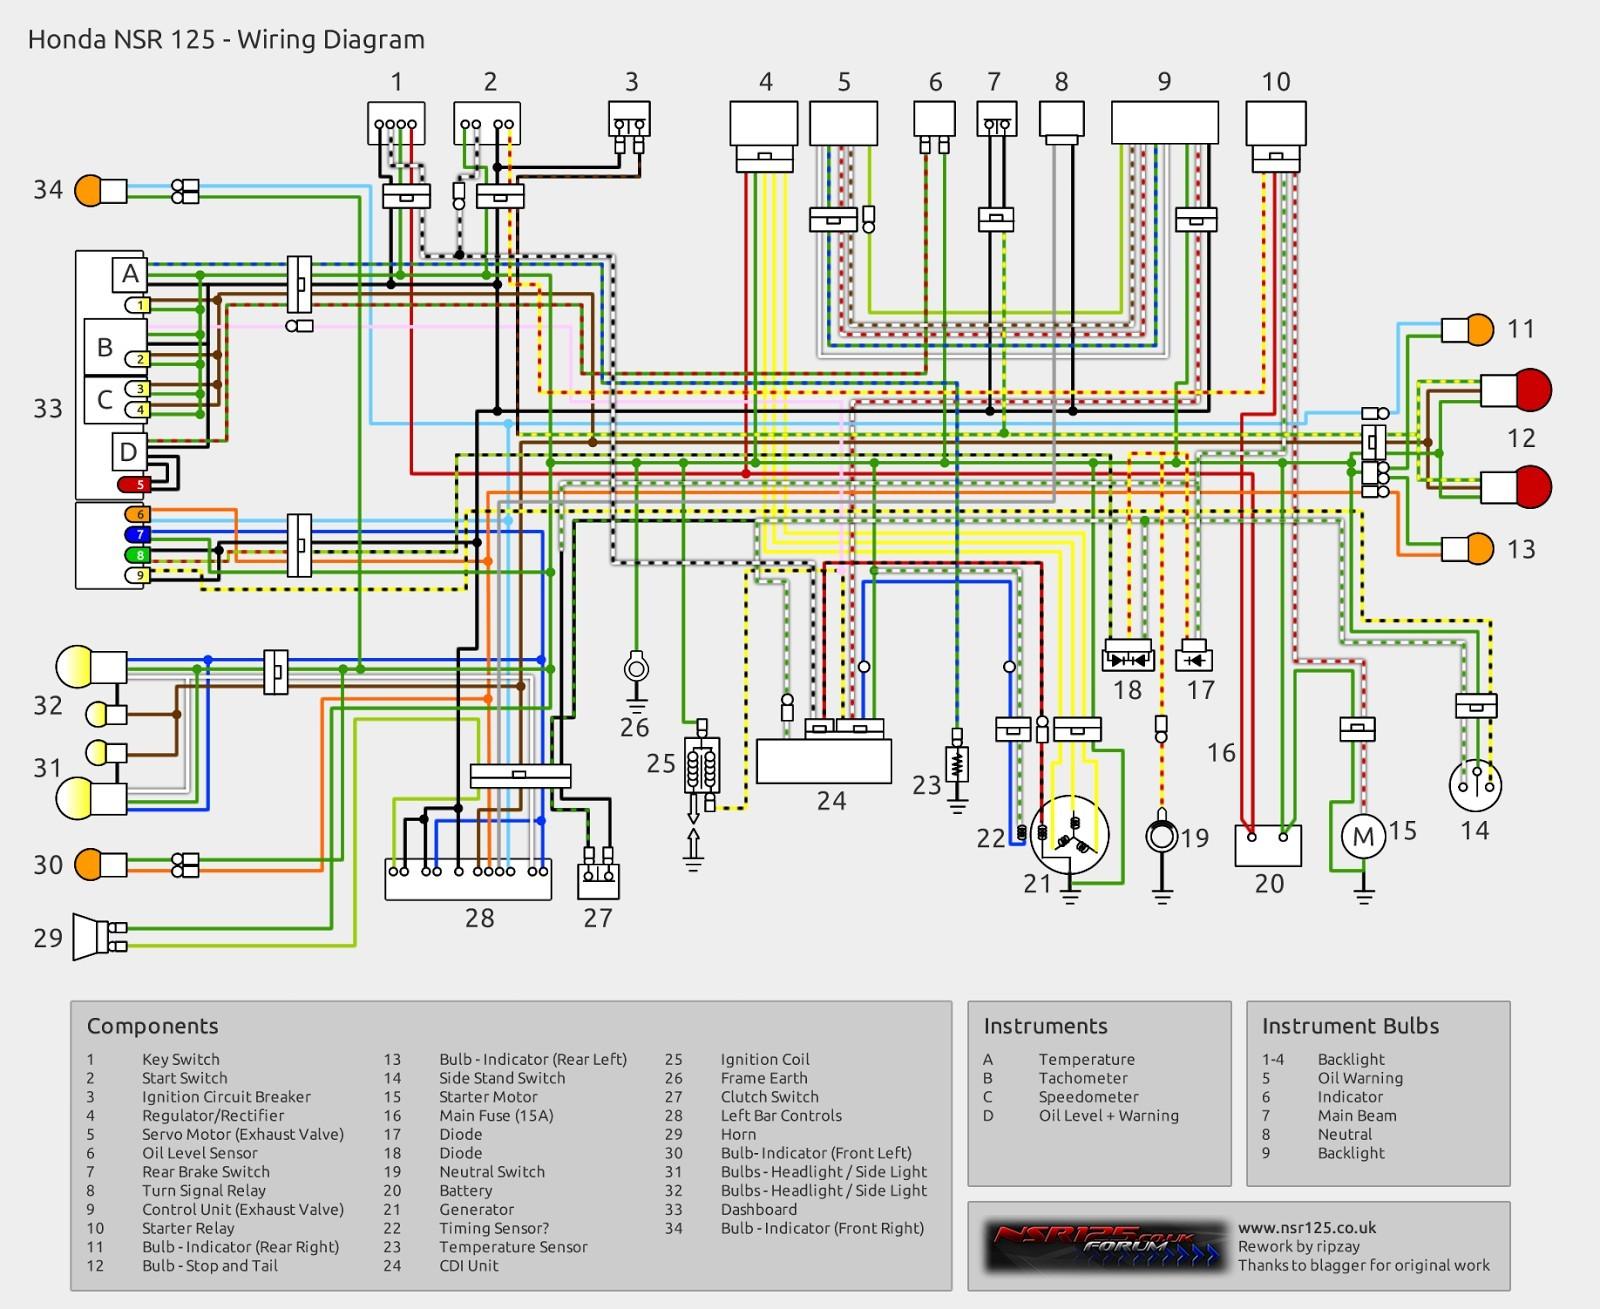 hight resolution of honda xr 125 wiring diagram irelandnews best wiring diagrams of honda xr 125 wiring diagram diagram